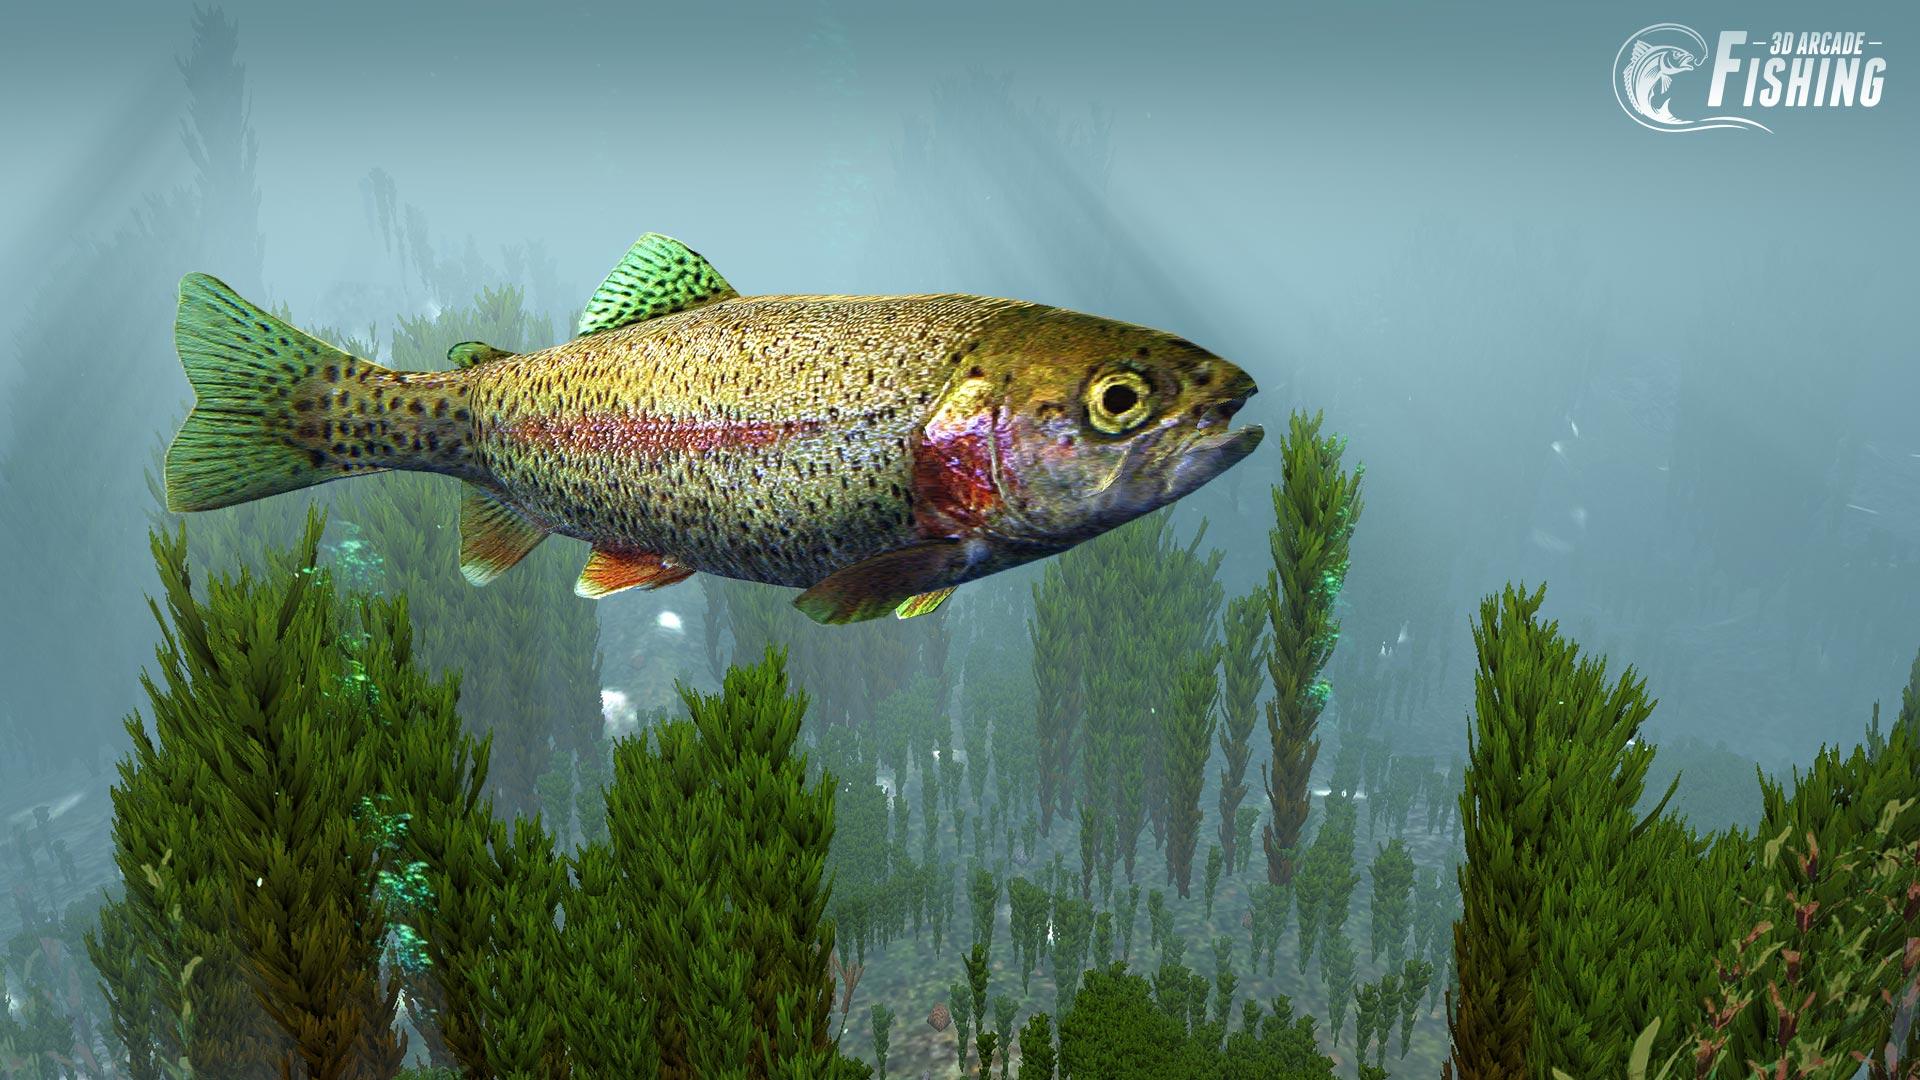 Showcase :: 3D Arcade Fishing